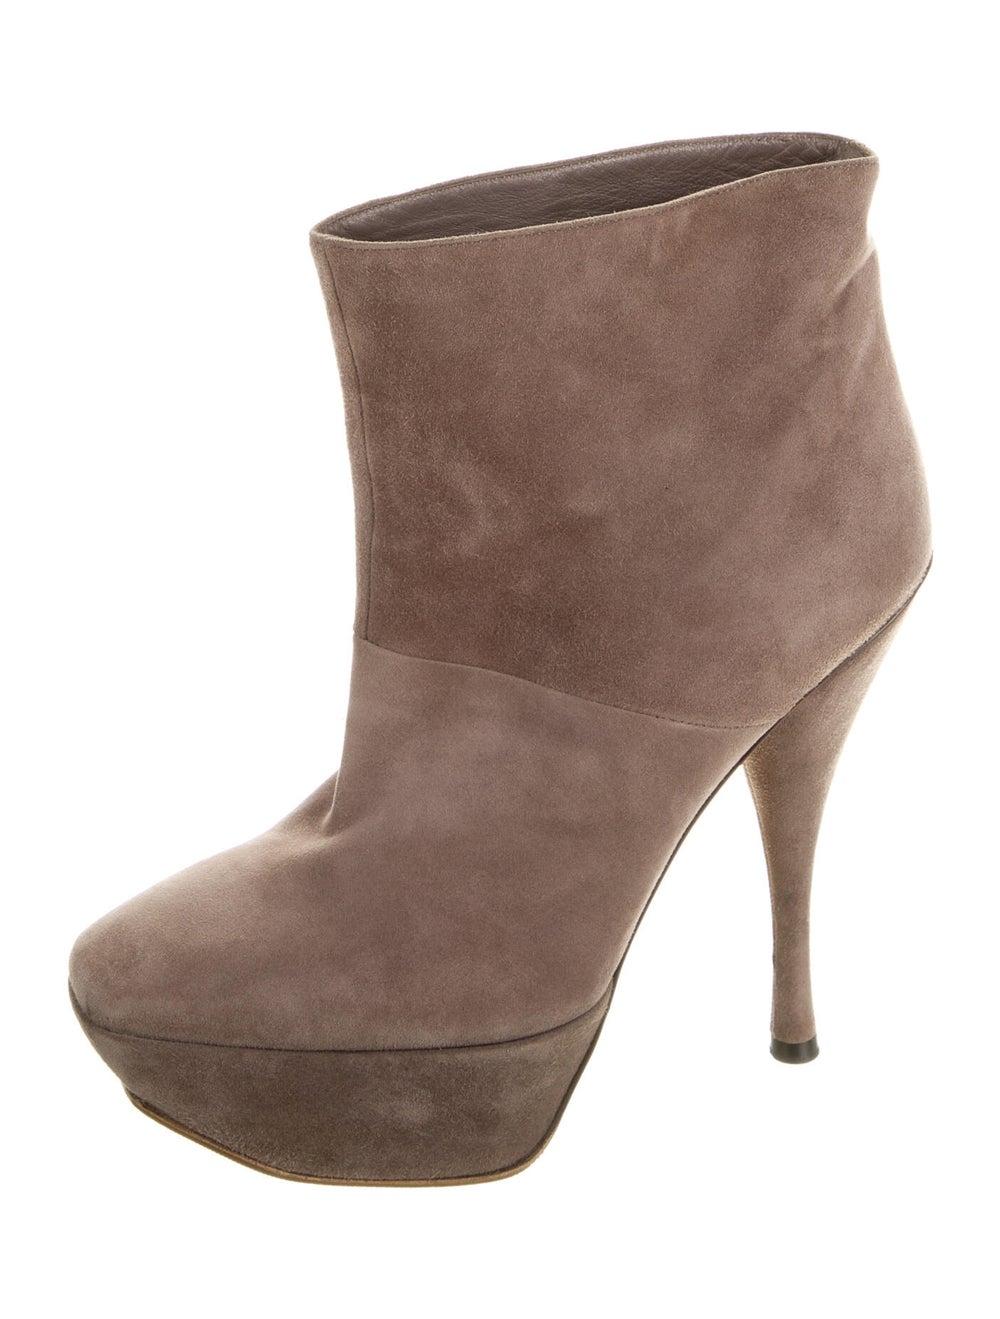 Marni Boots - image 2